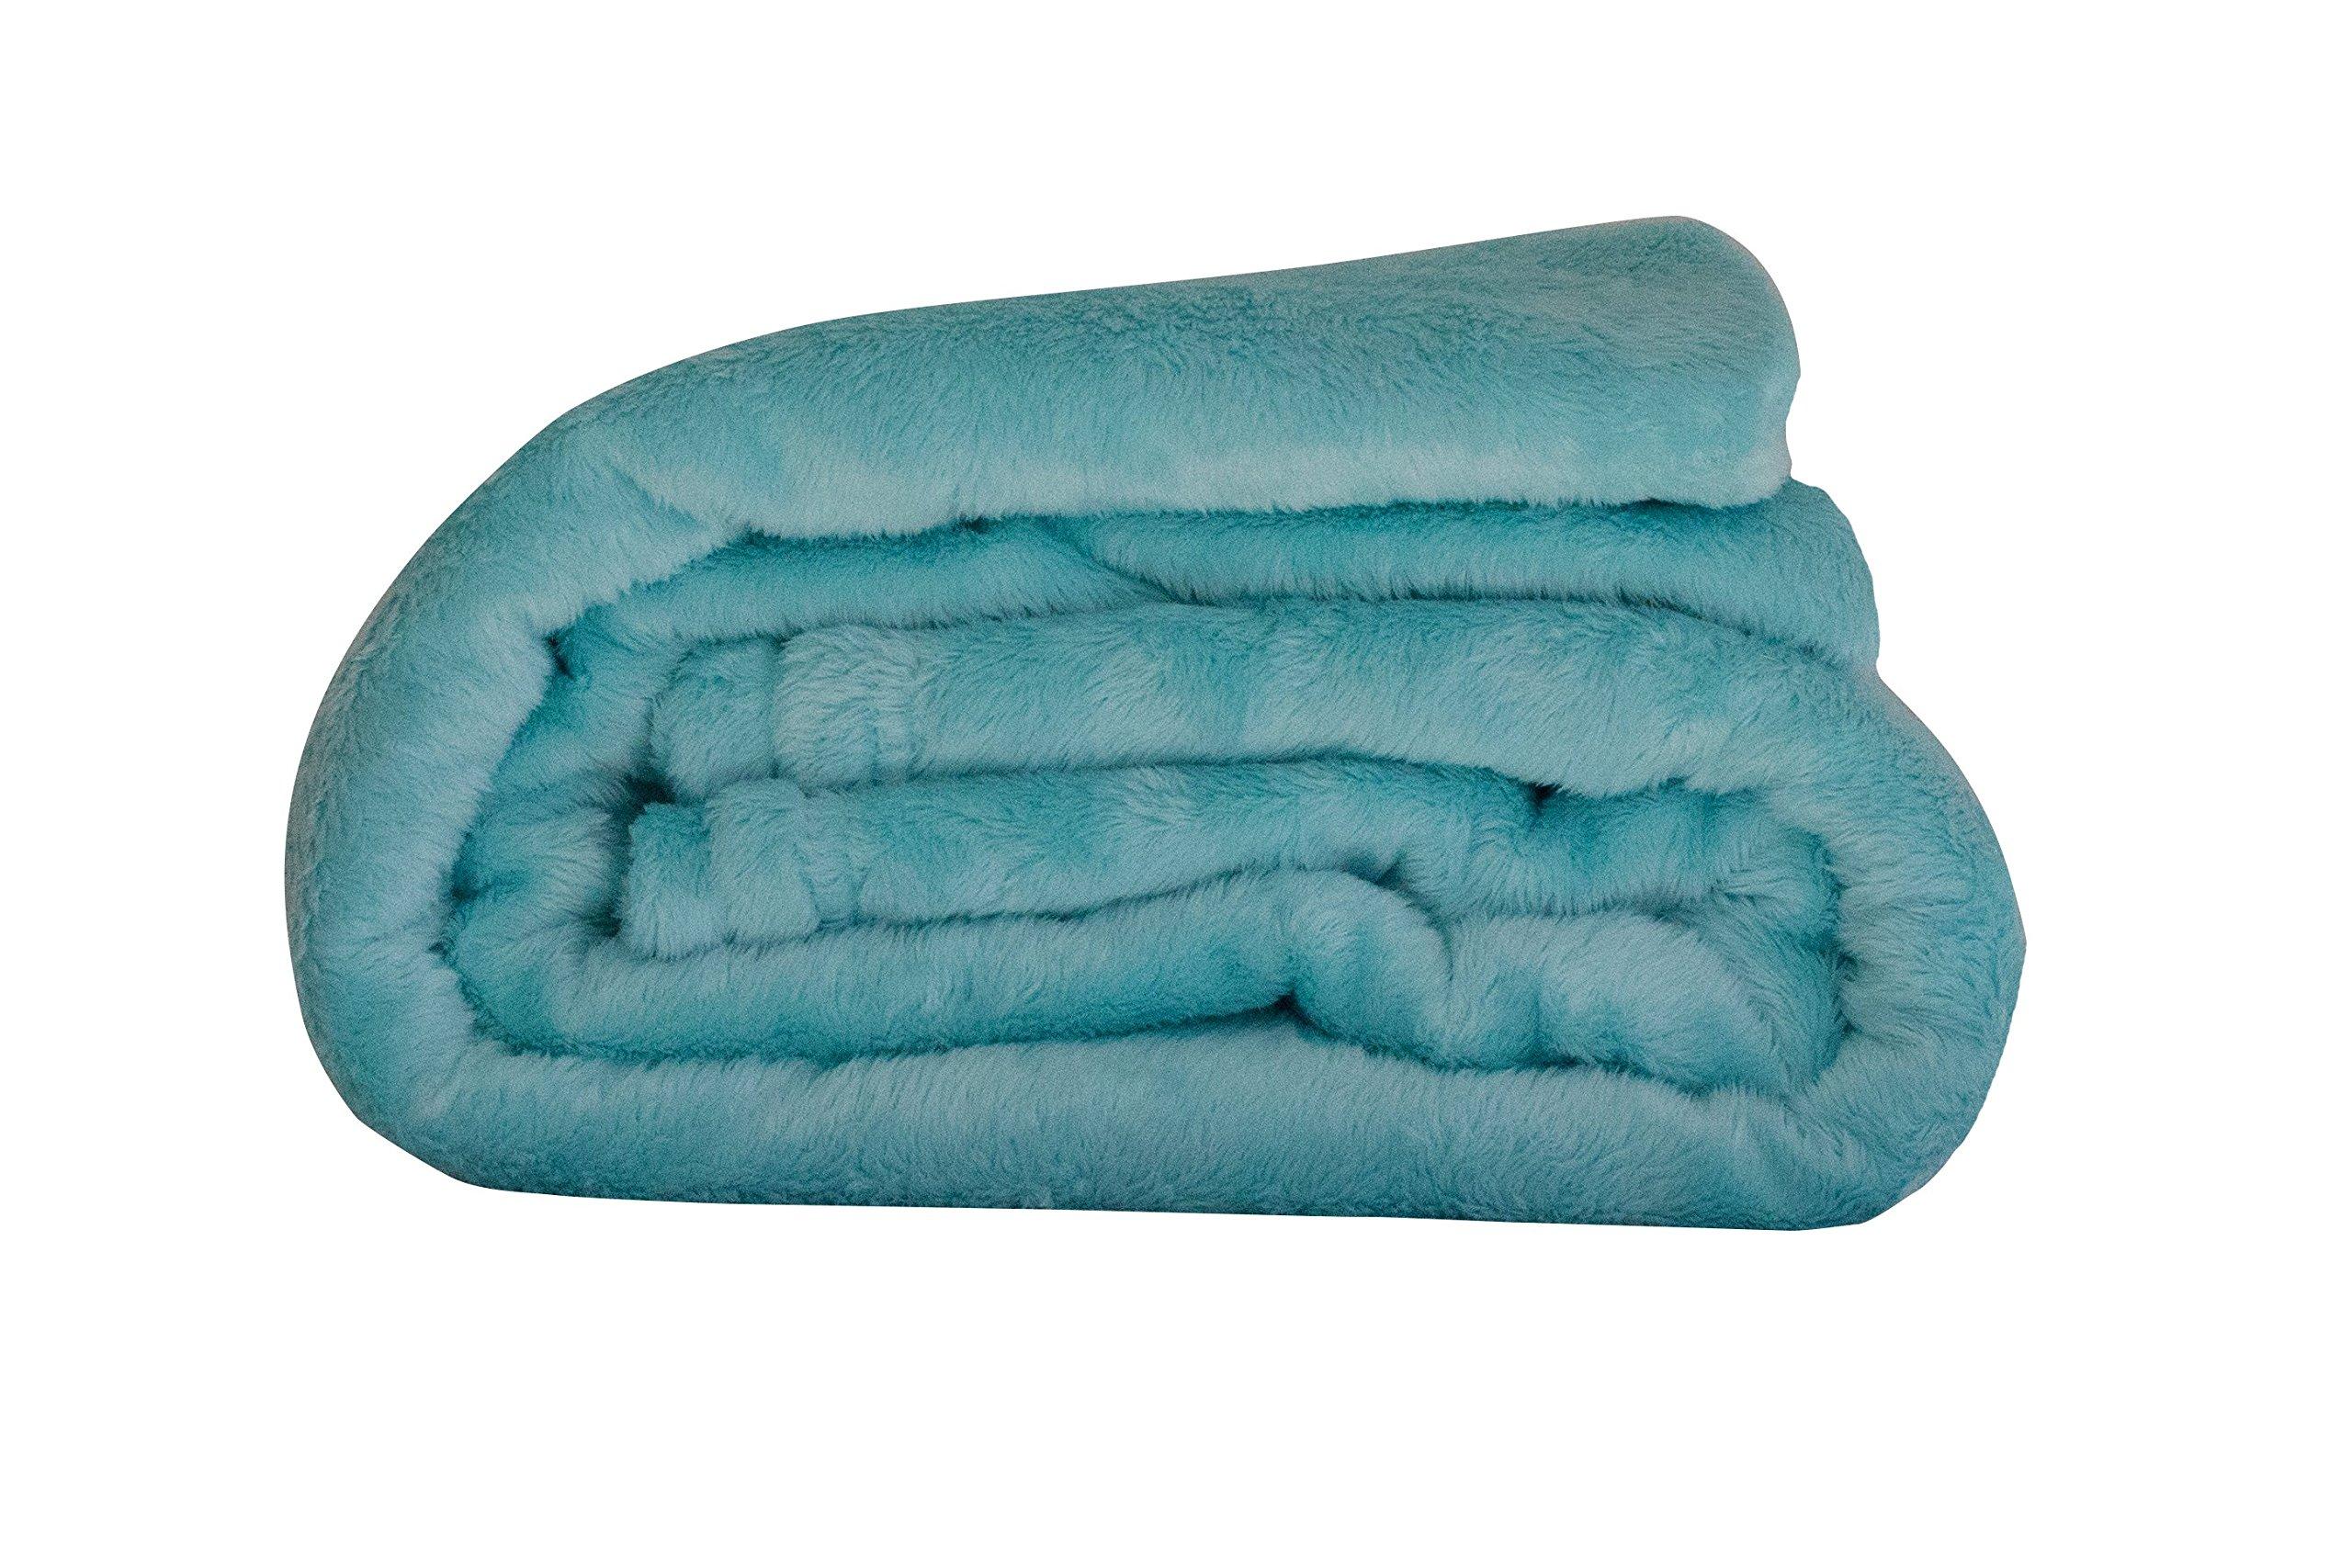 Tourma-Blanket Seafoam Green Deluxe Blanket from FIR (far Infrared) Industries